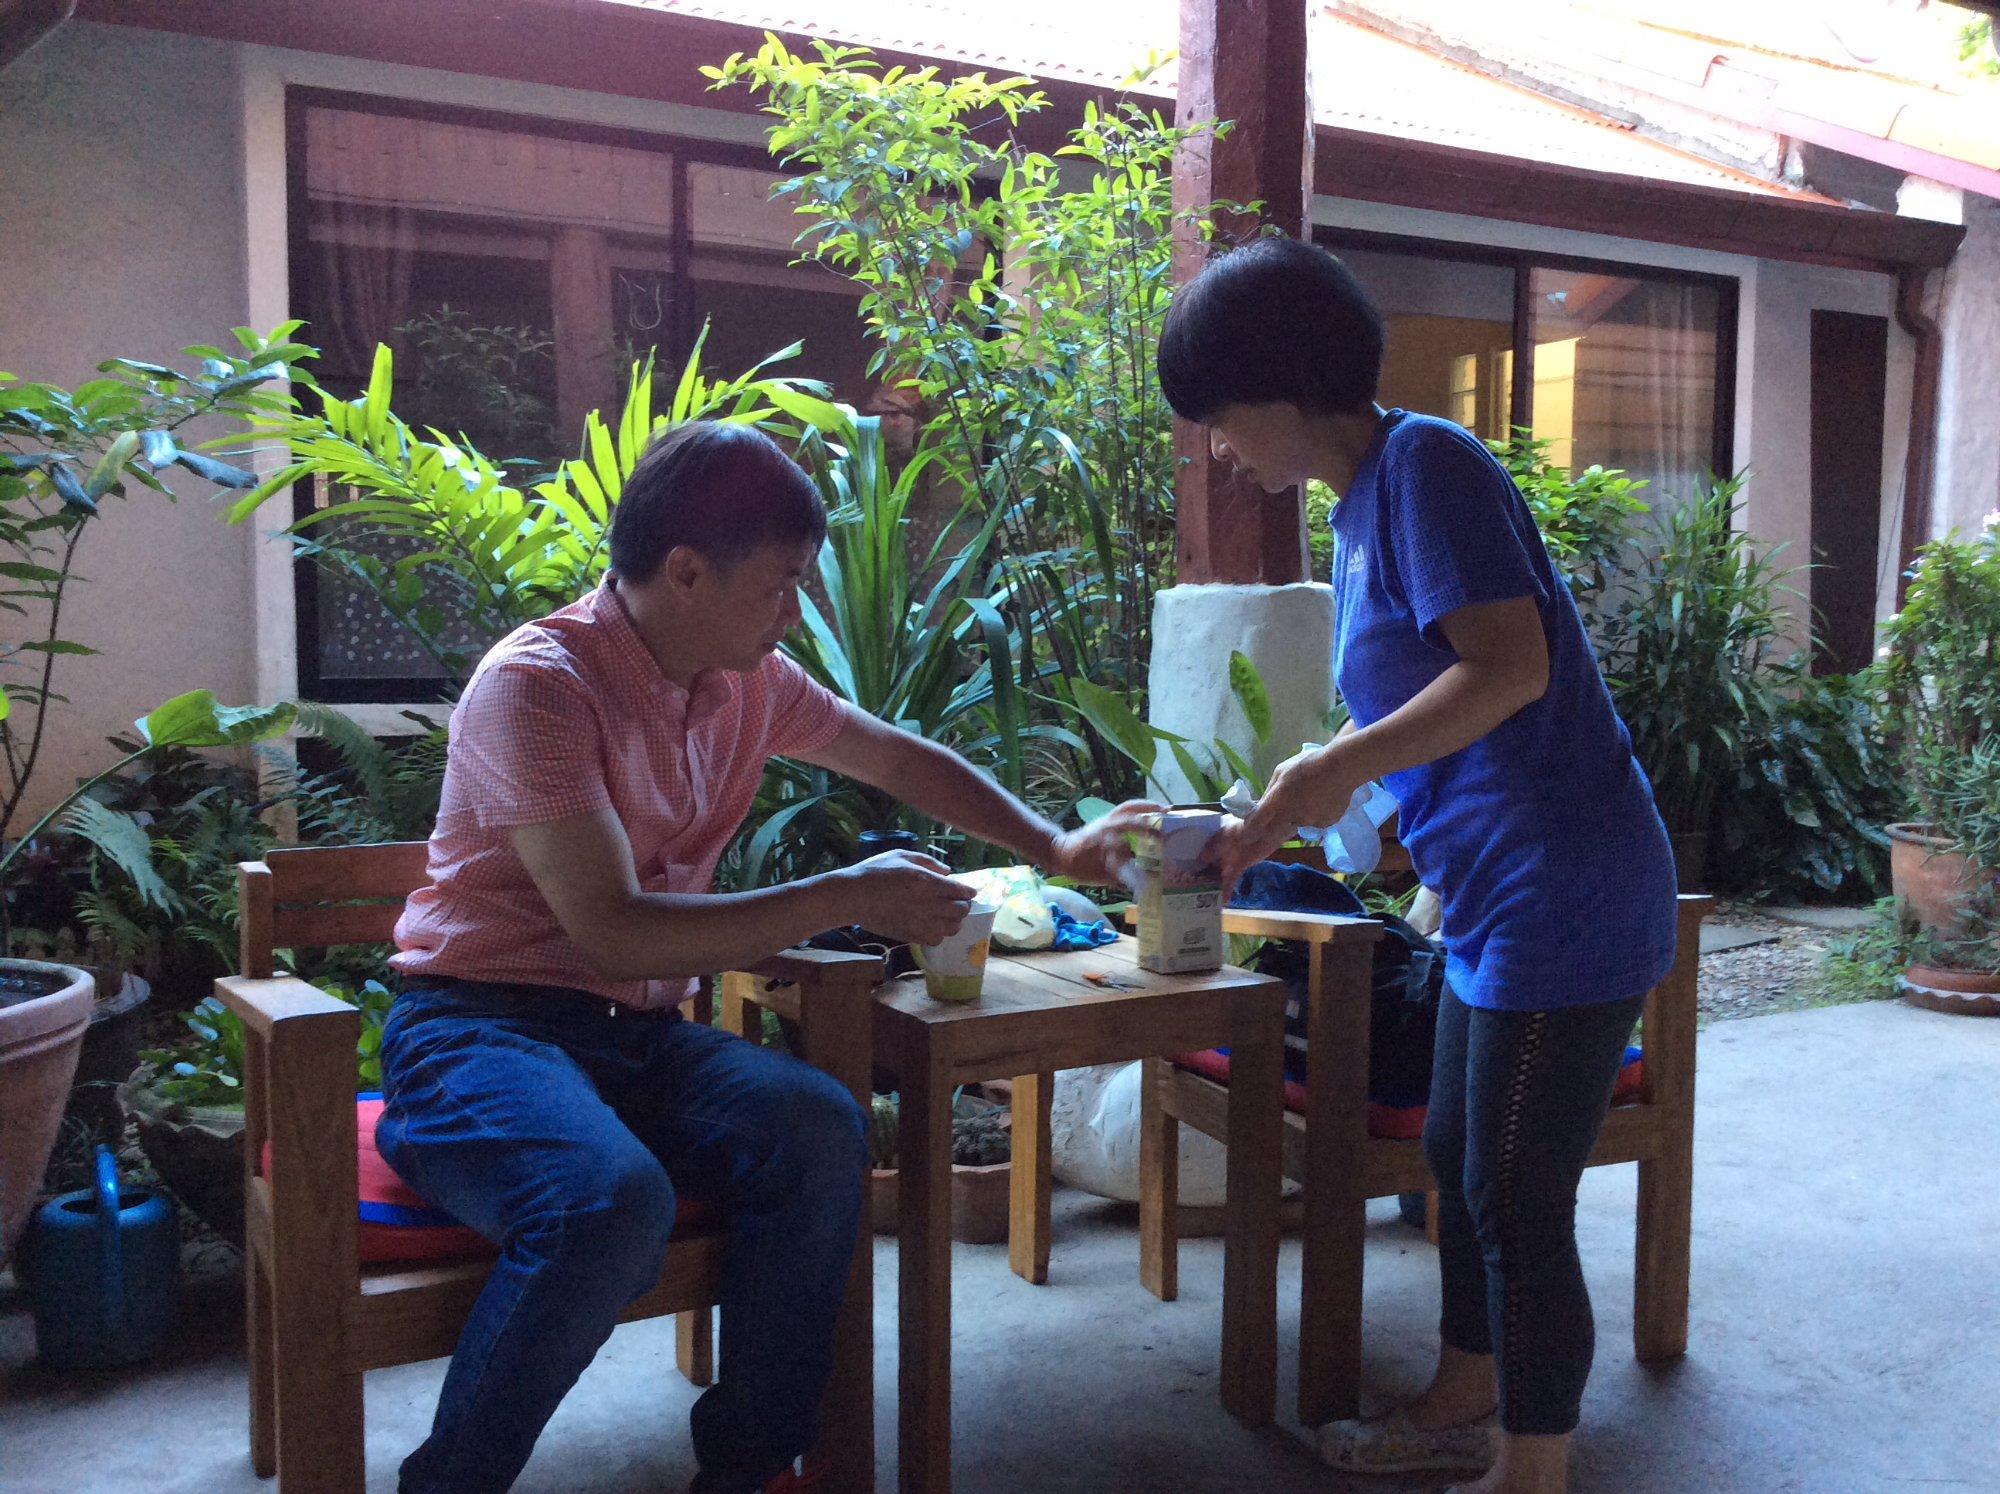 Chiang Mai Erwachsenenunterhaltung Bewertungen